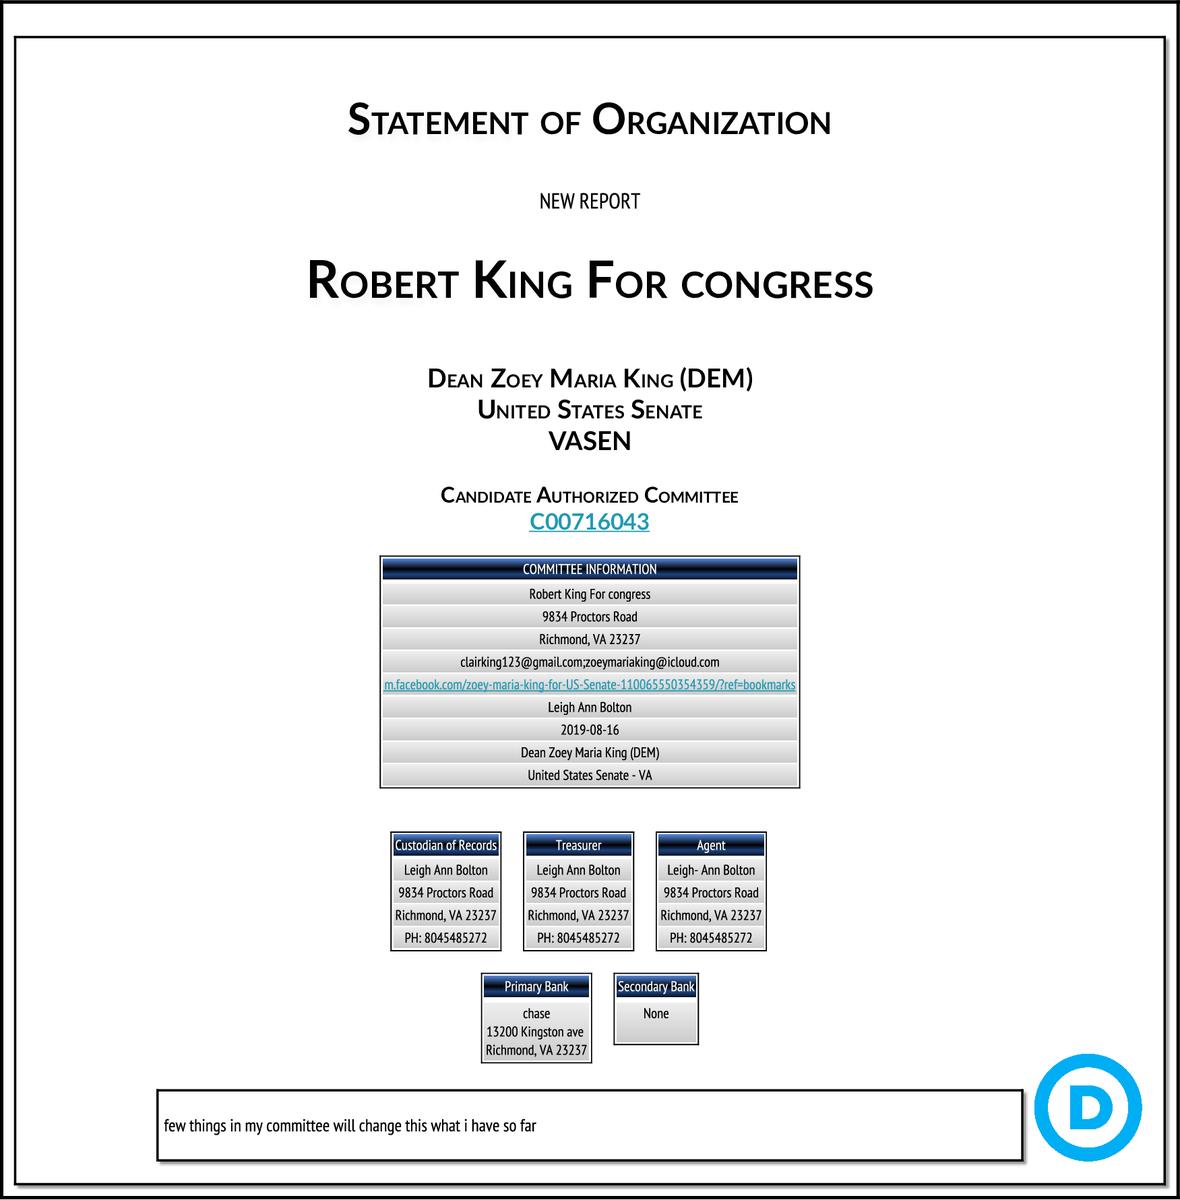 NEW FEC F1 #VASEN Robert King For congress  http:// classic.fec.gov/fecviewer/Comm itteeDetailFilings.do?tabIndex=3&candidateCommitteeId=C00716043  … <br>http://pic.twitter.com/OjCZIDoU2K